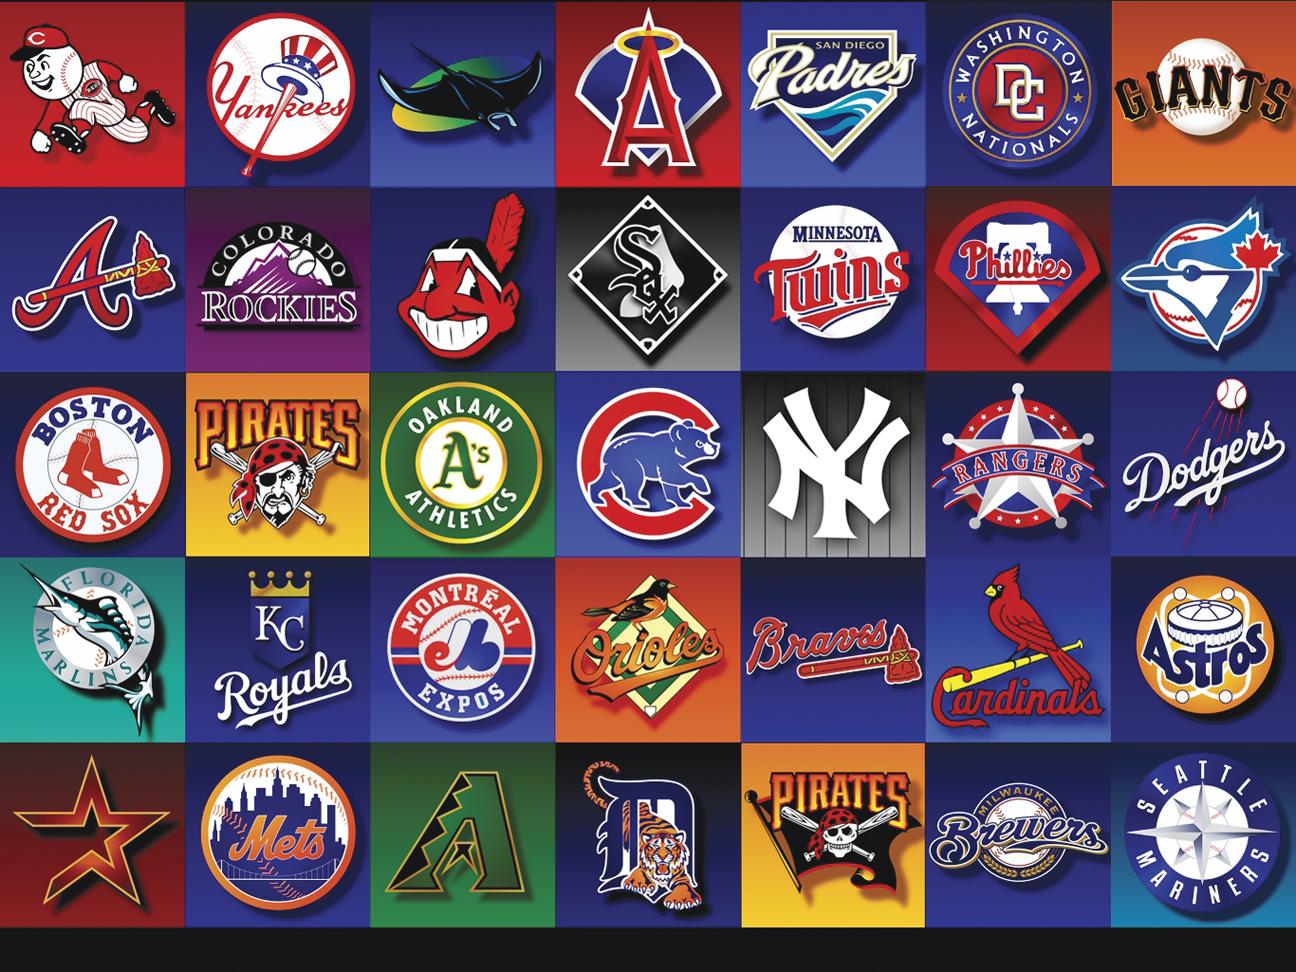 which major league baseball team has the best logo